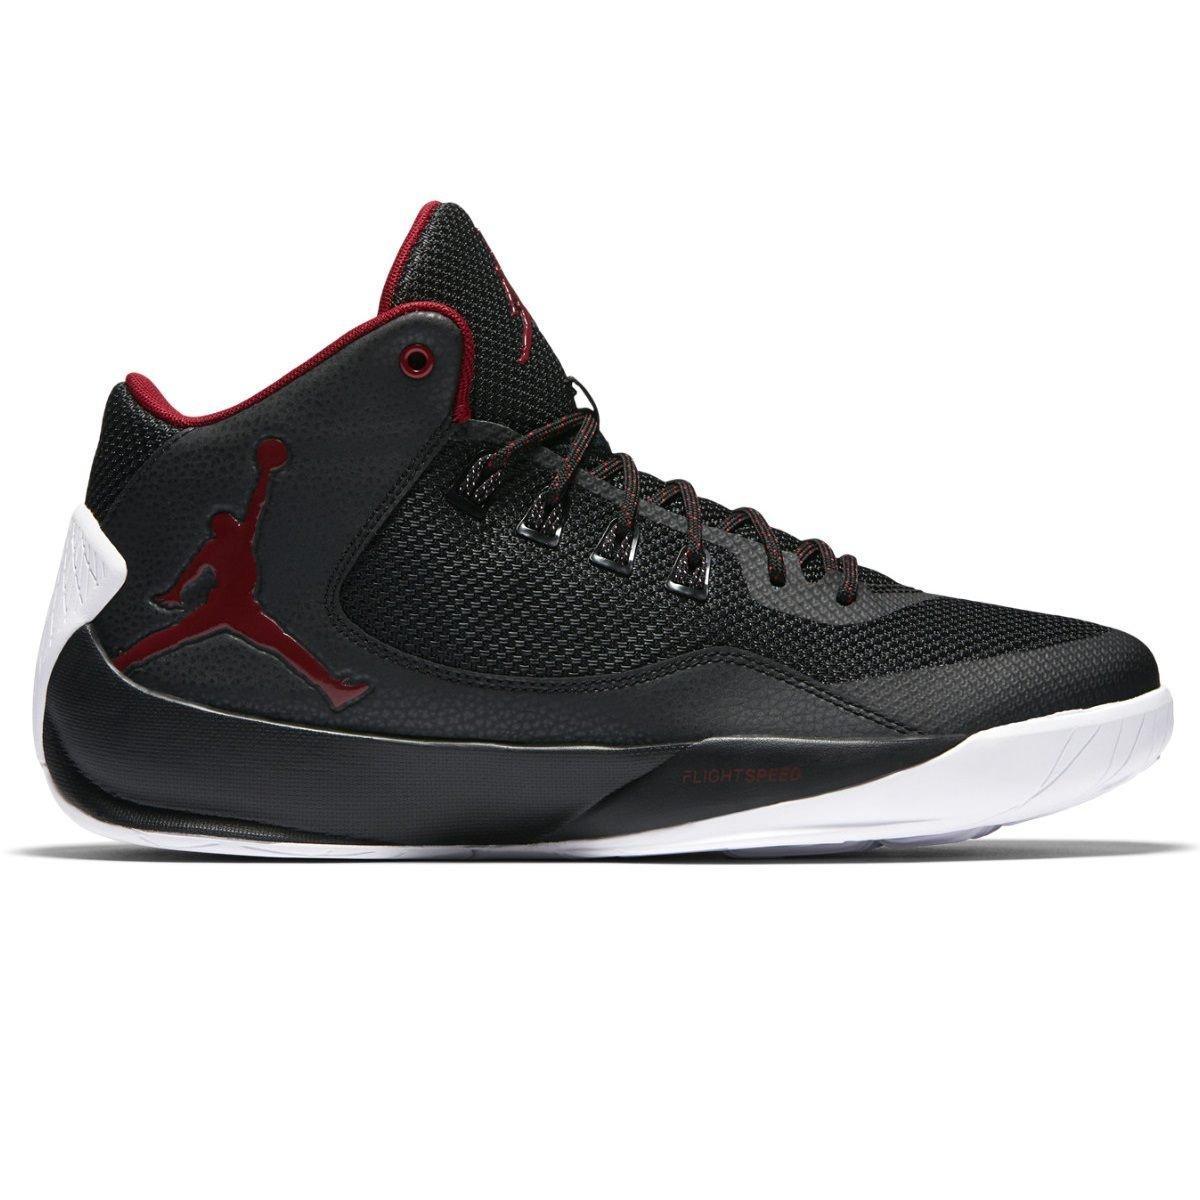 Jordan Rising High 2 Men US 11 Black Basketball Shoe by Jordan